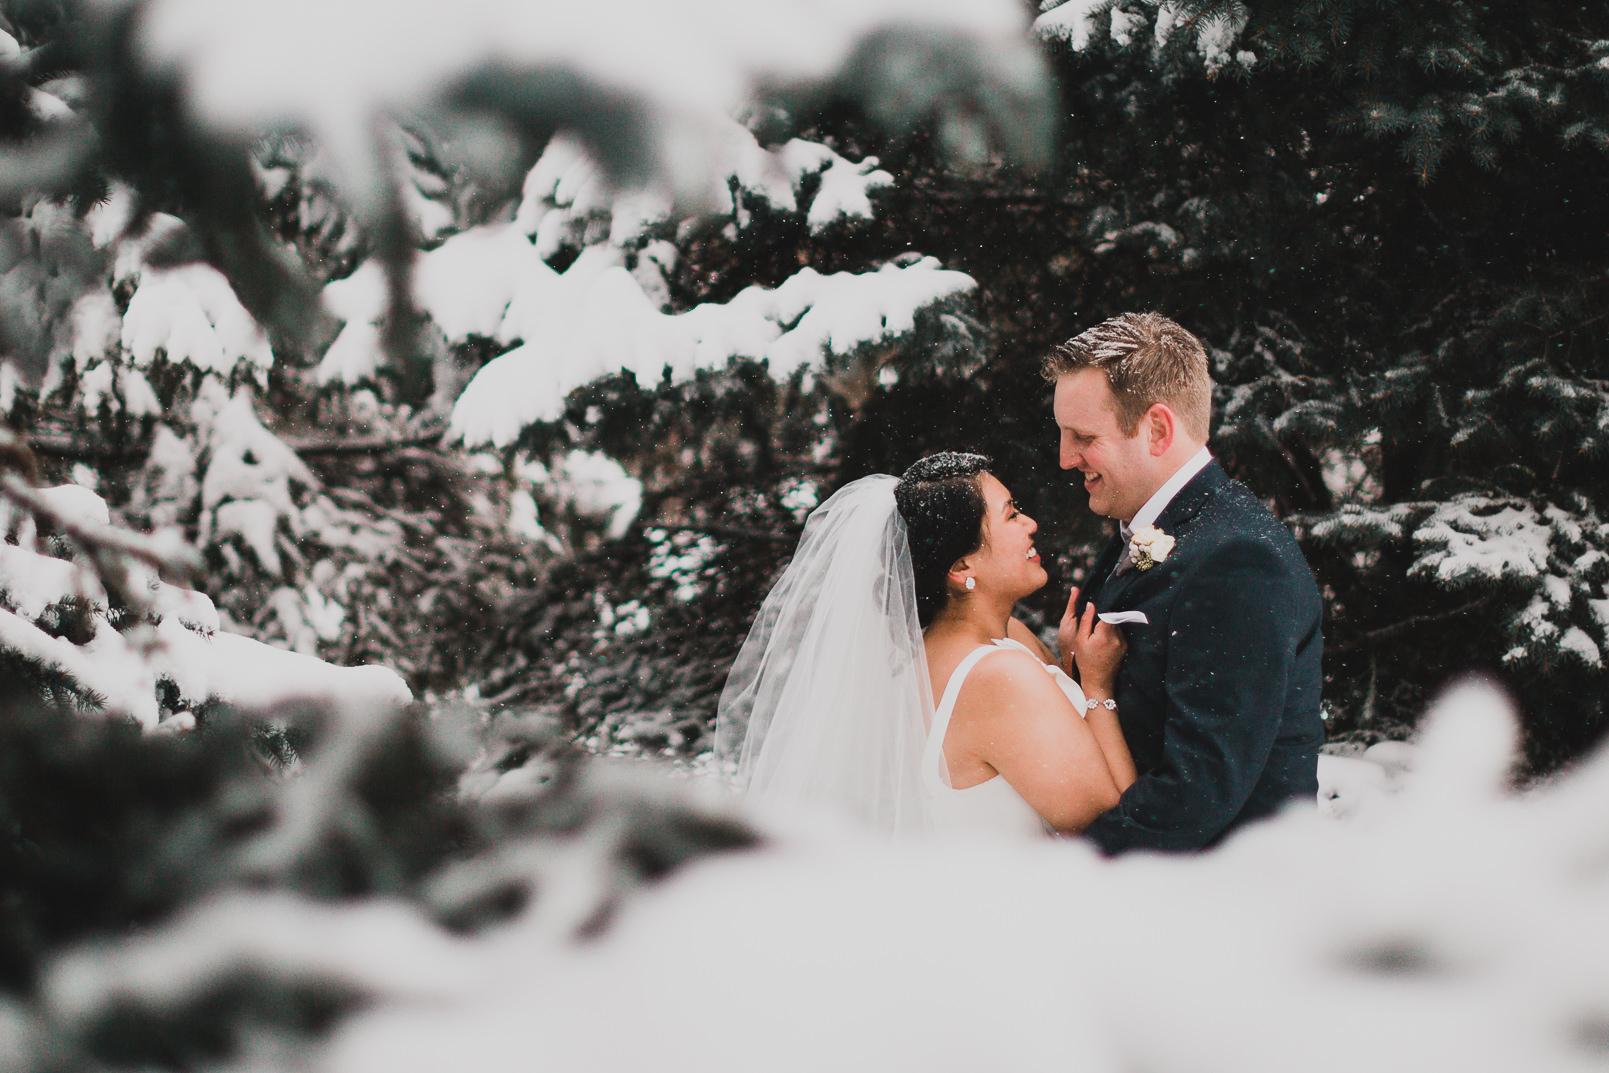 035-Jonathan-Kuhn-Photography-Wedding-_mini.jpg